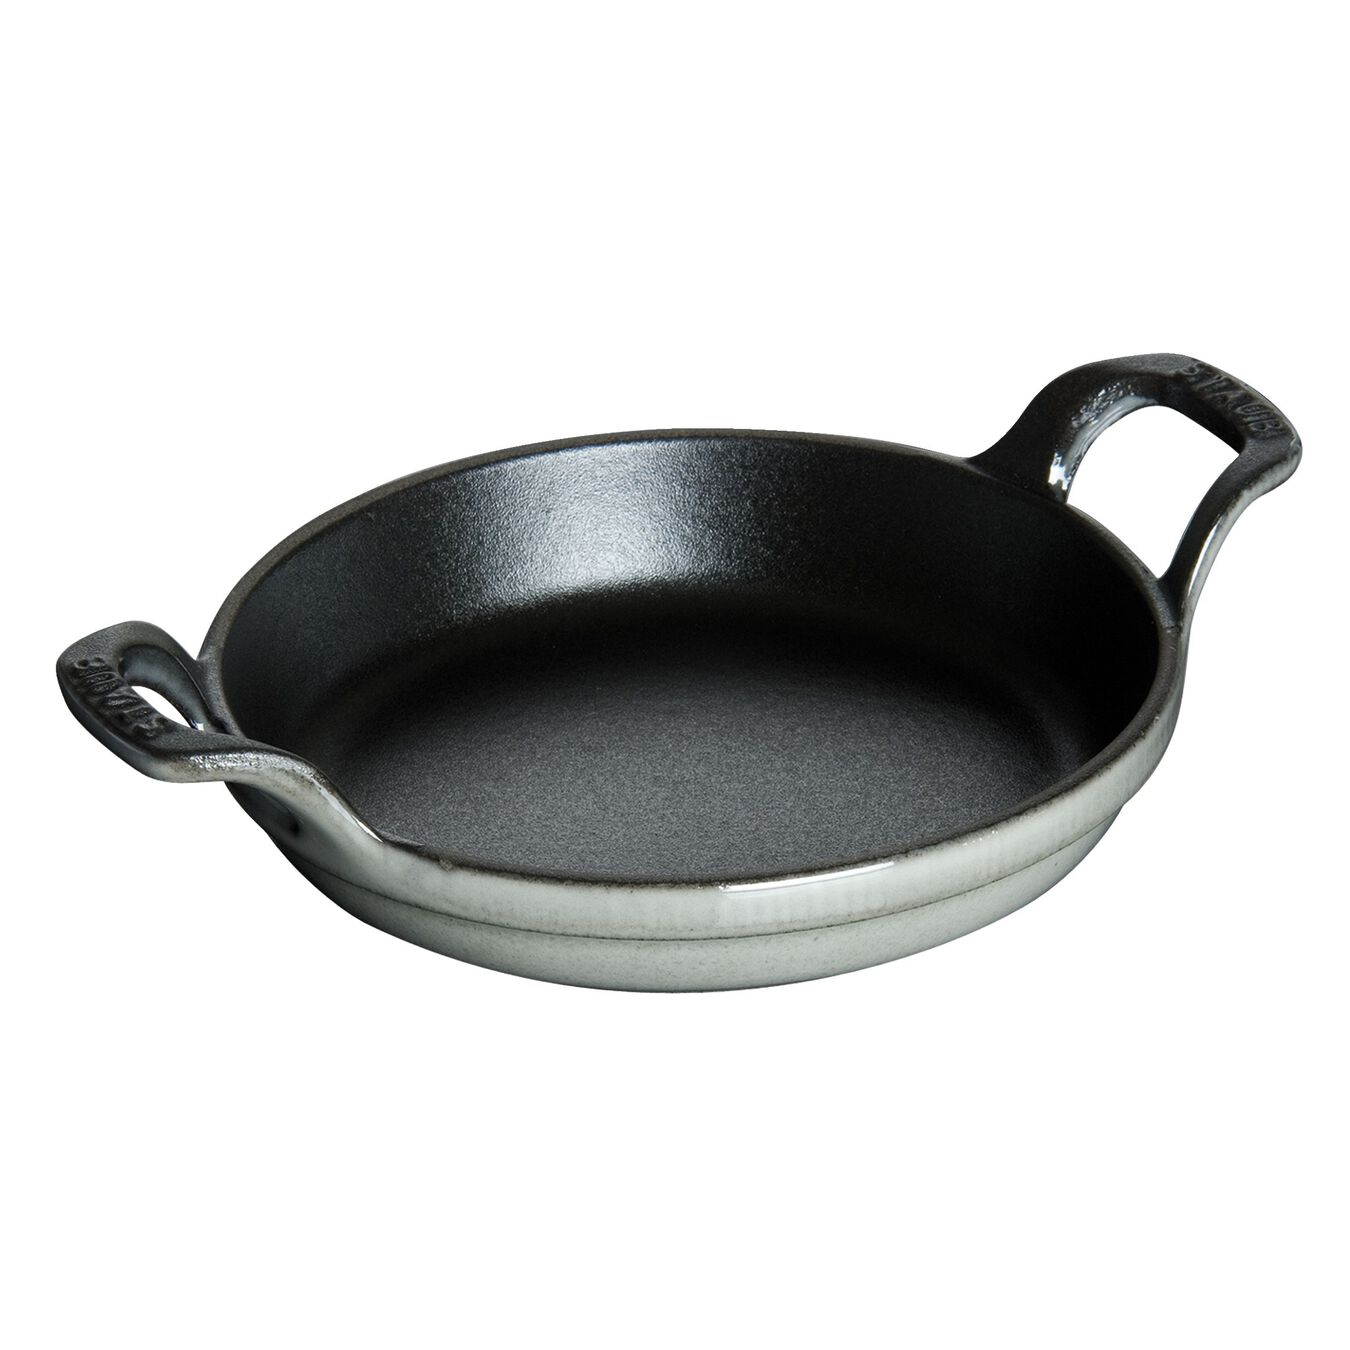 7.5-inch, round, Gratin Baking Dish, graphite grey,,large 2